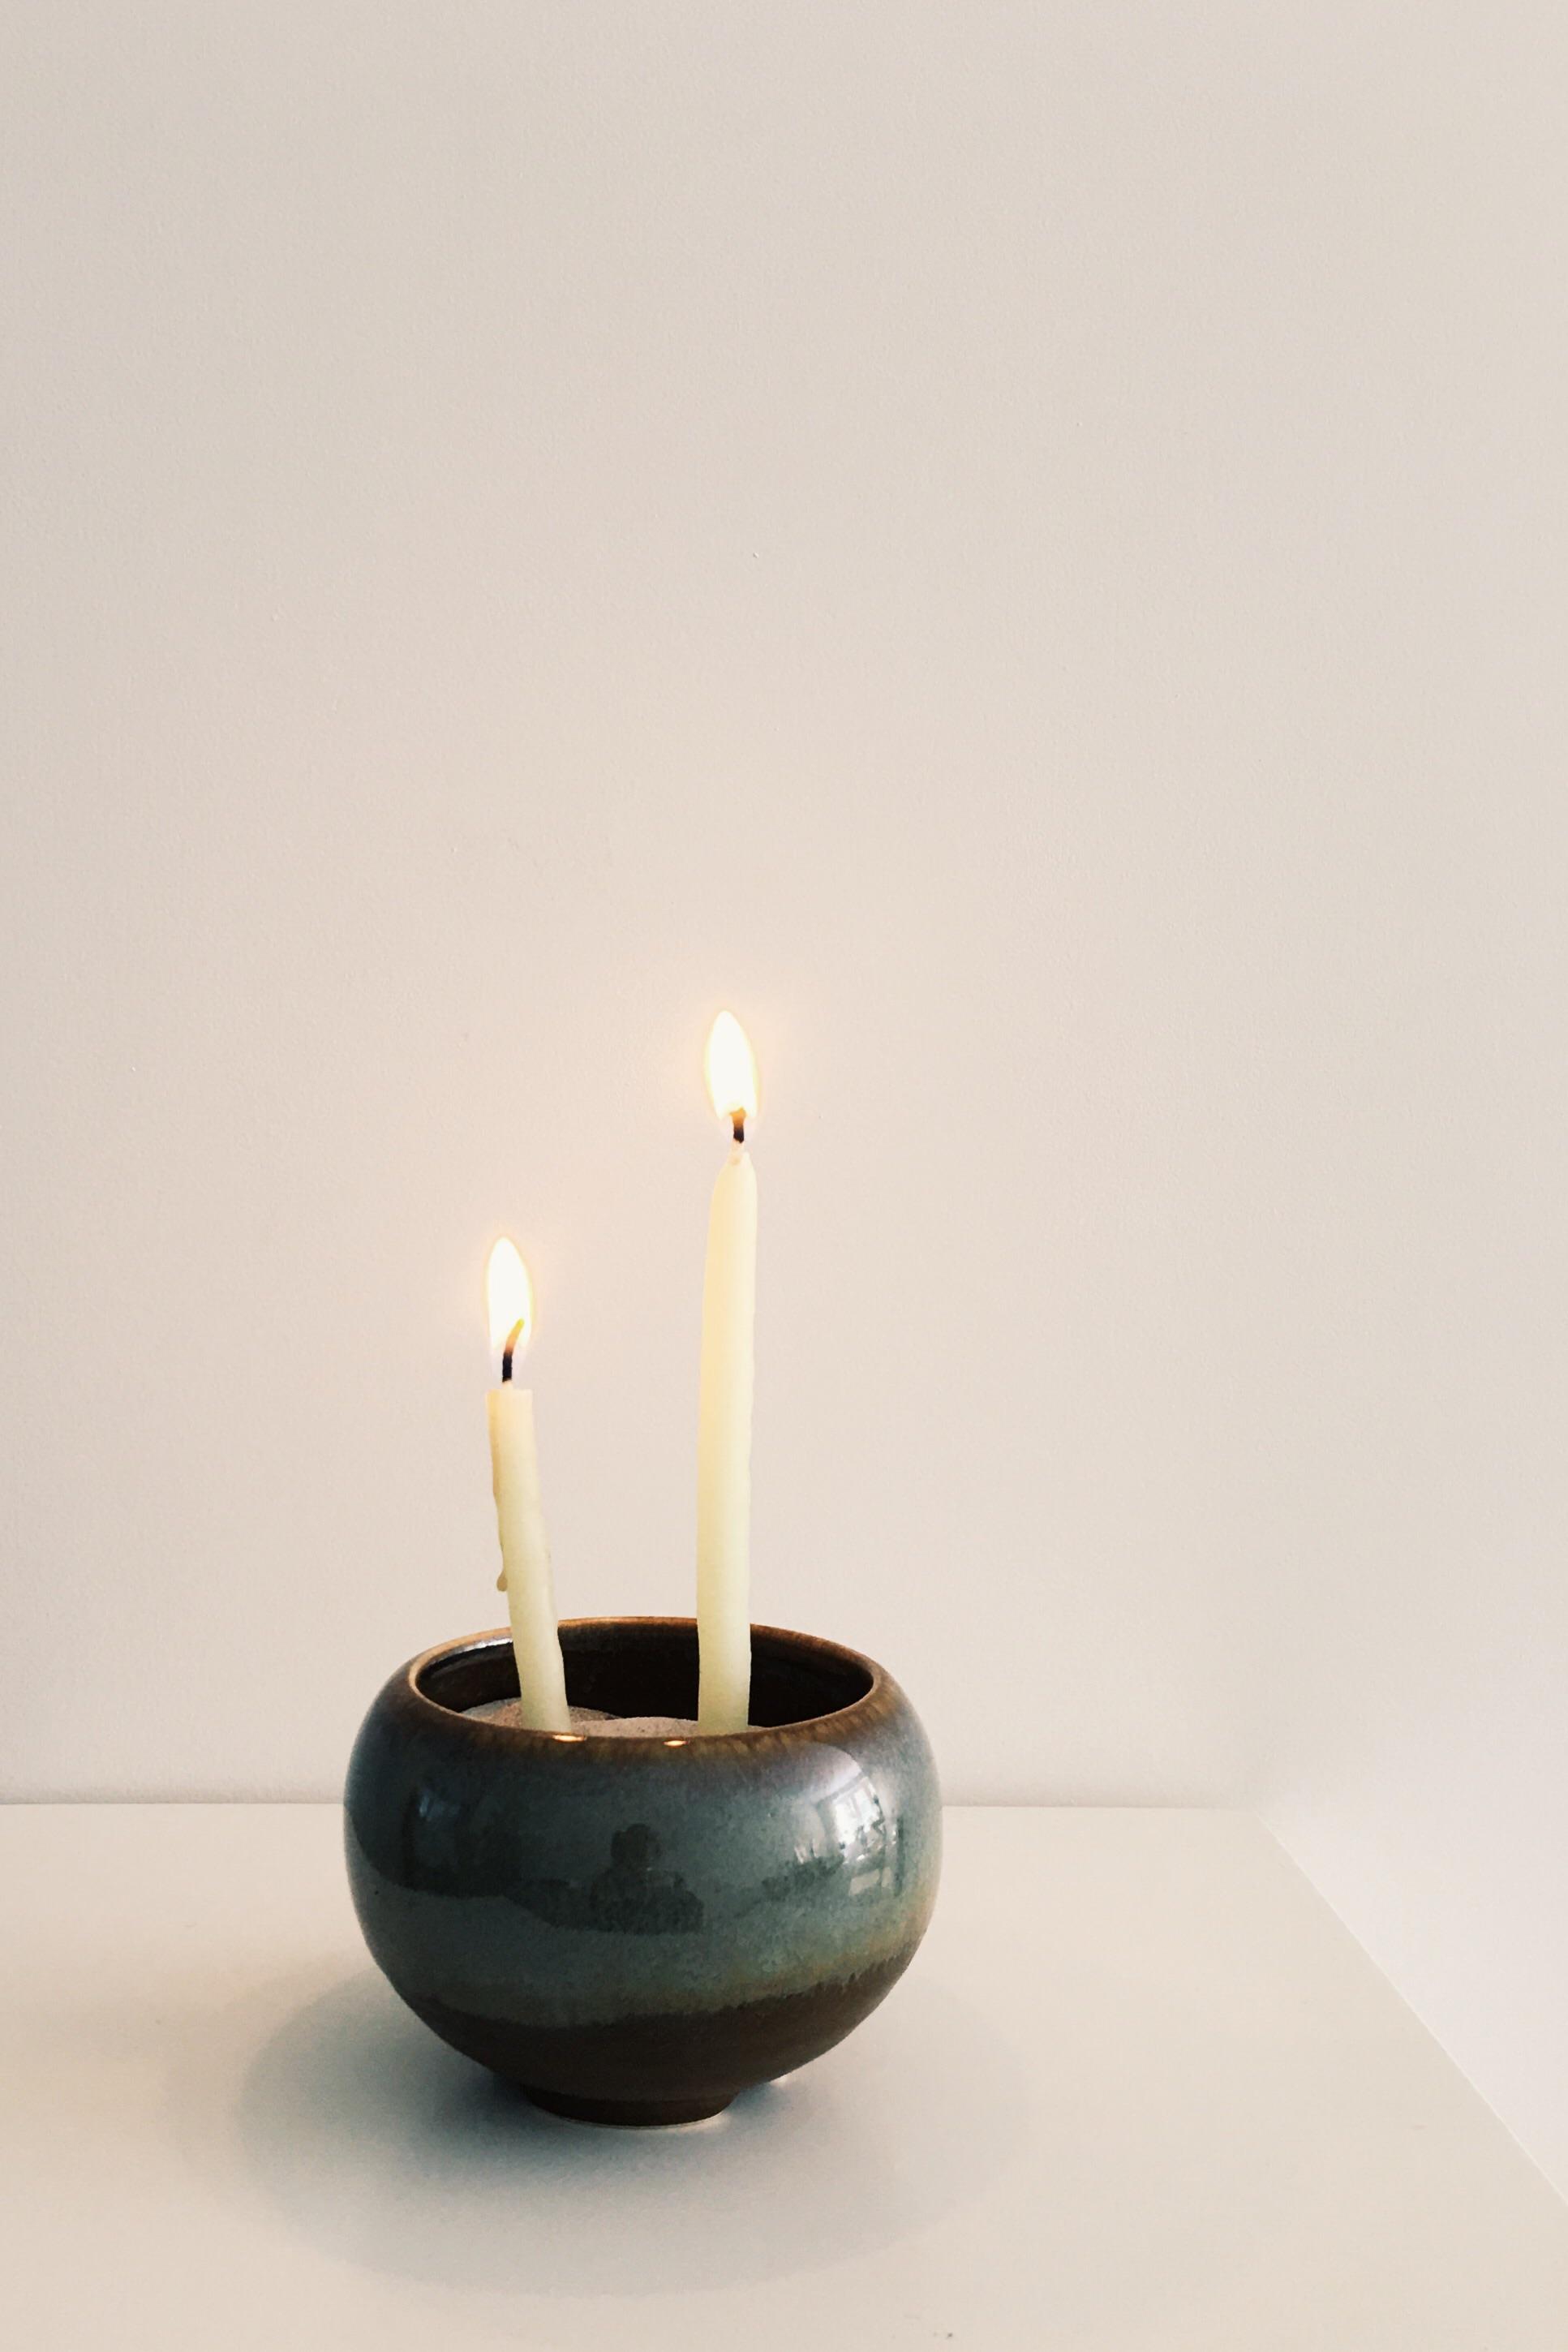 Incense bowl shoyeido, burninglights prayer candle